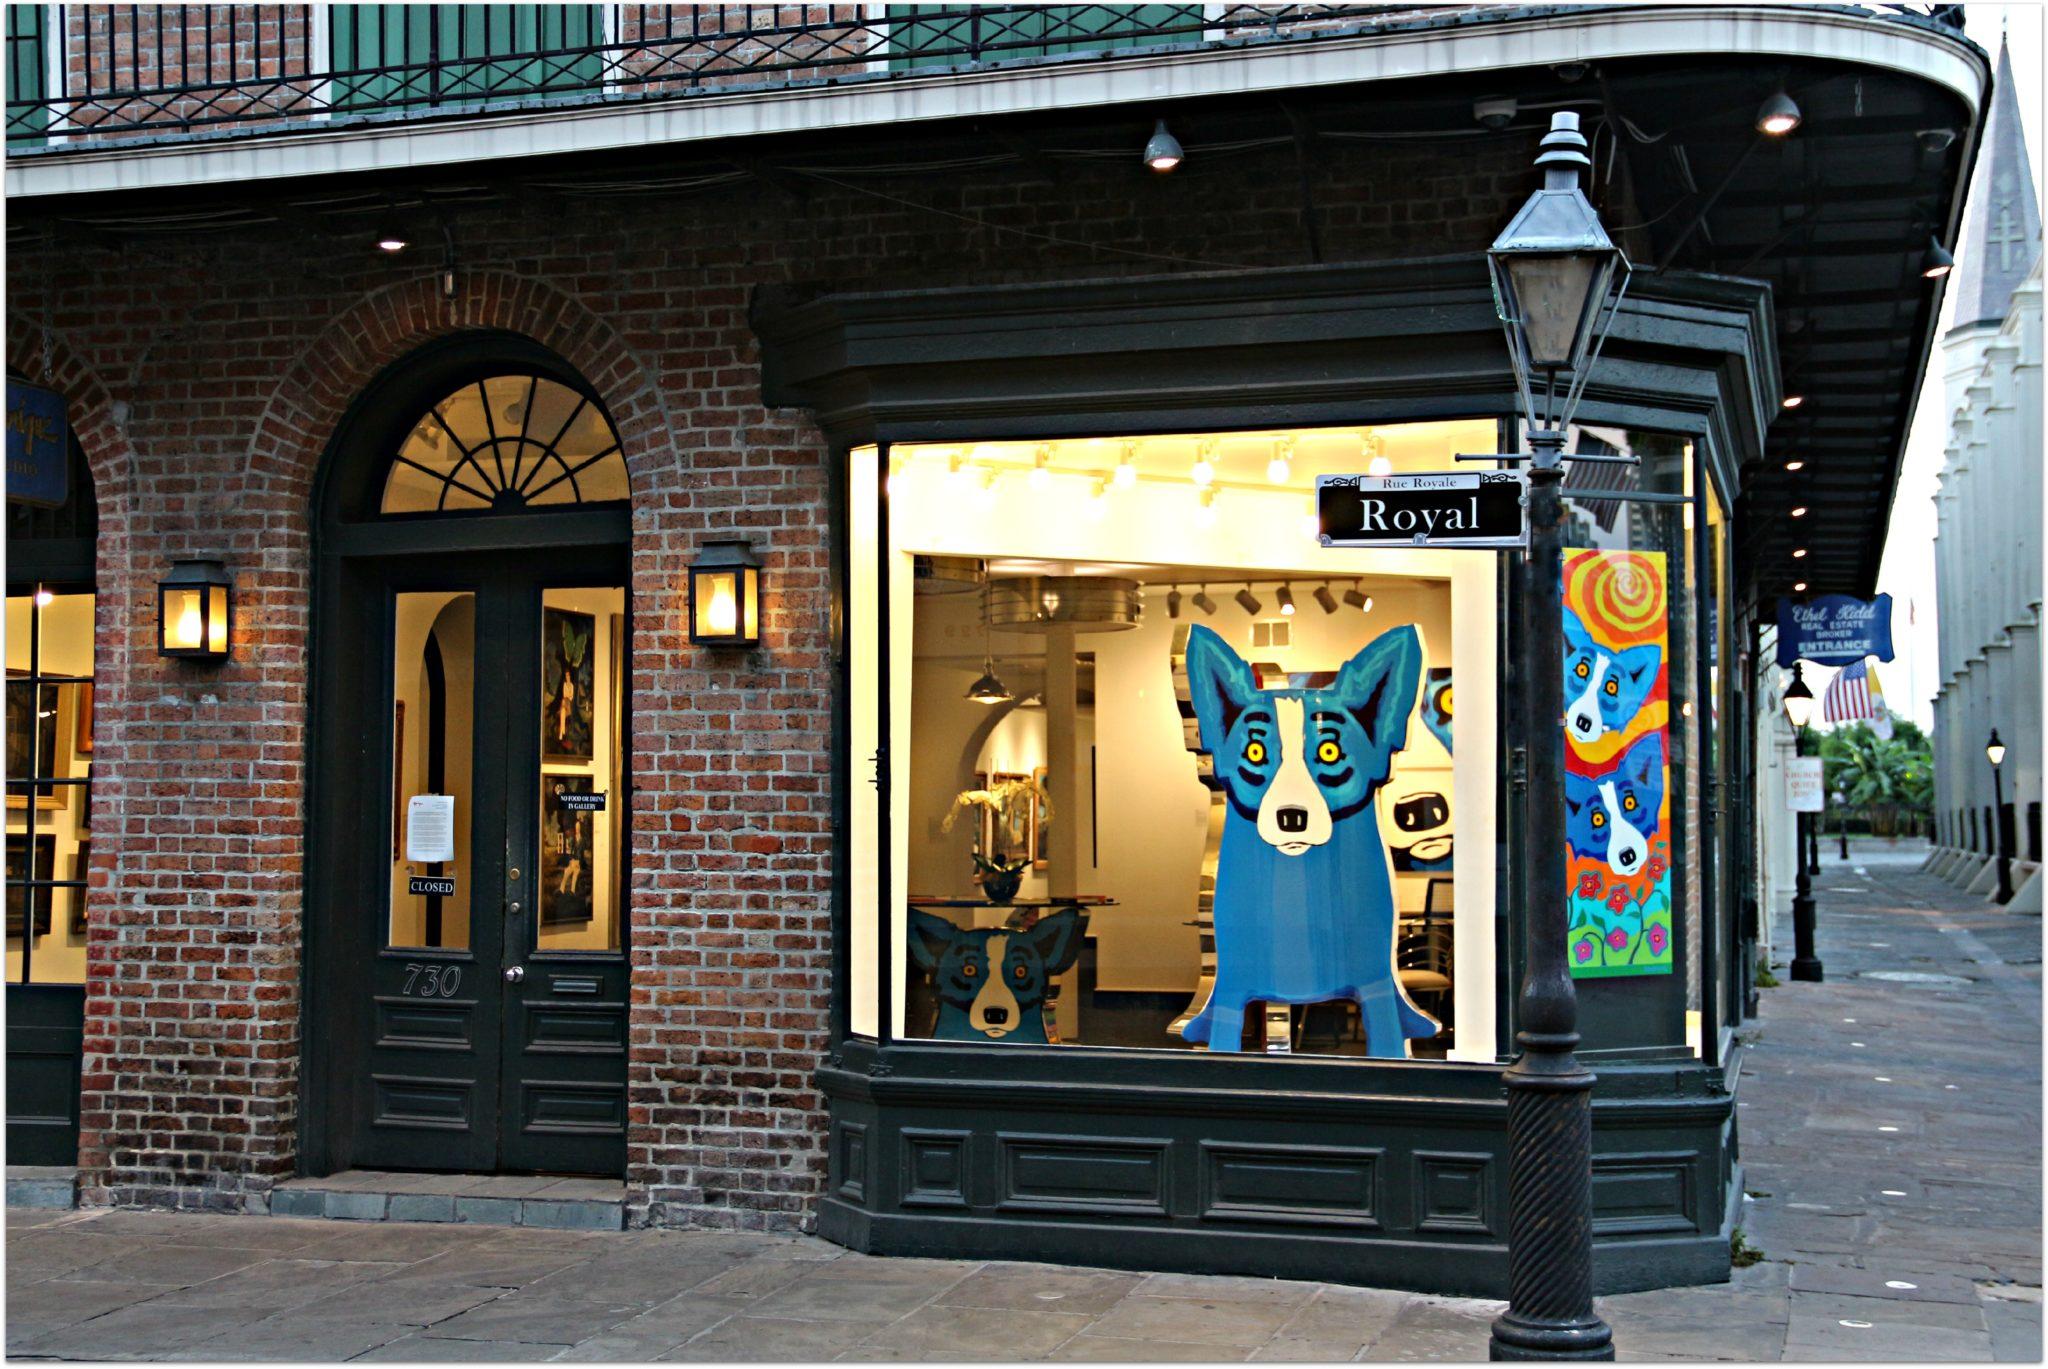 Art Galleries on Royal Street